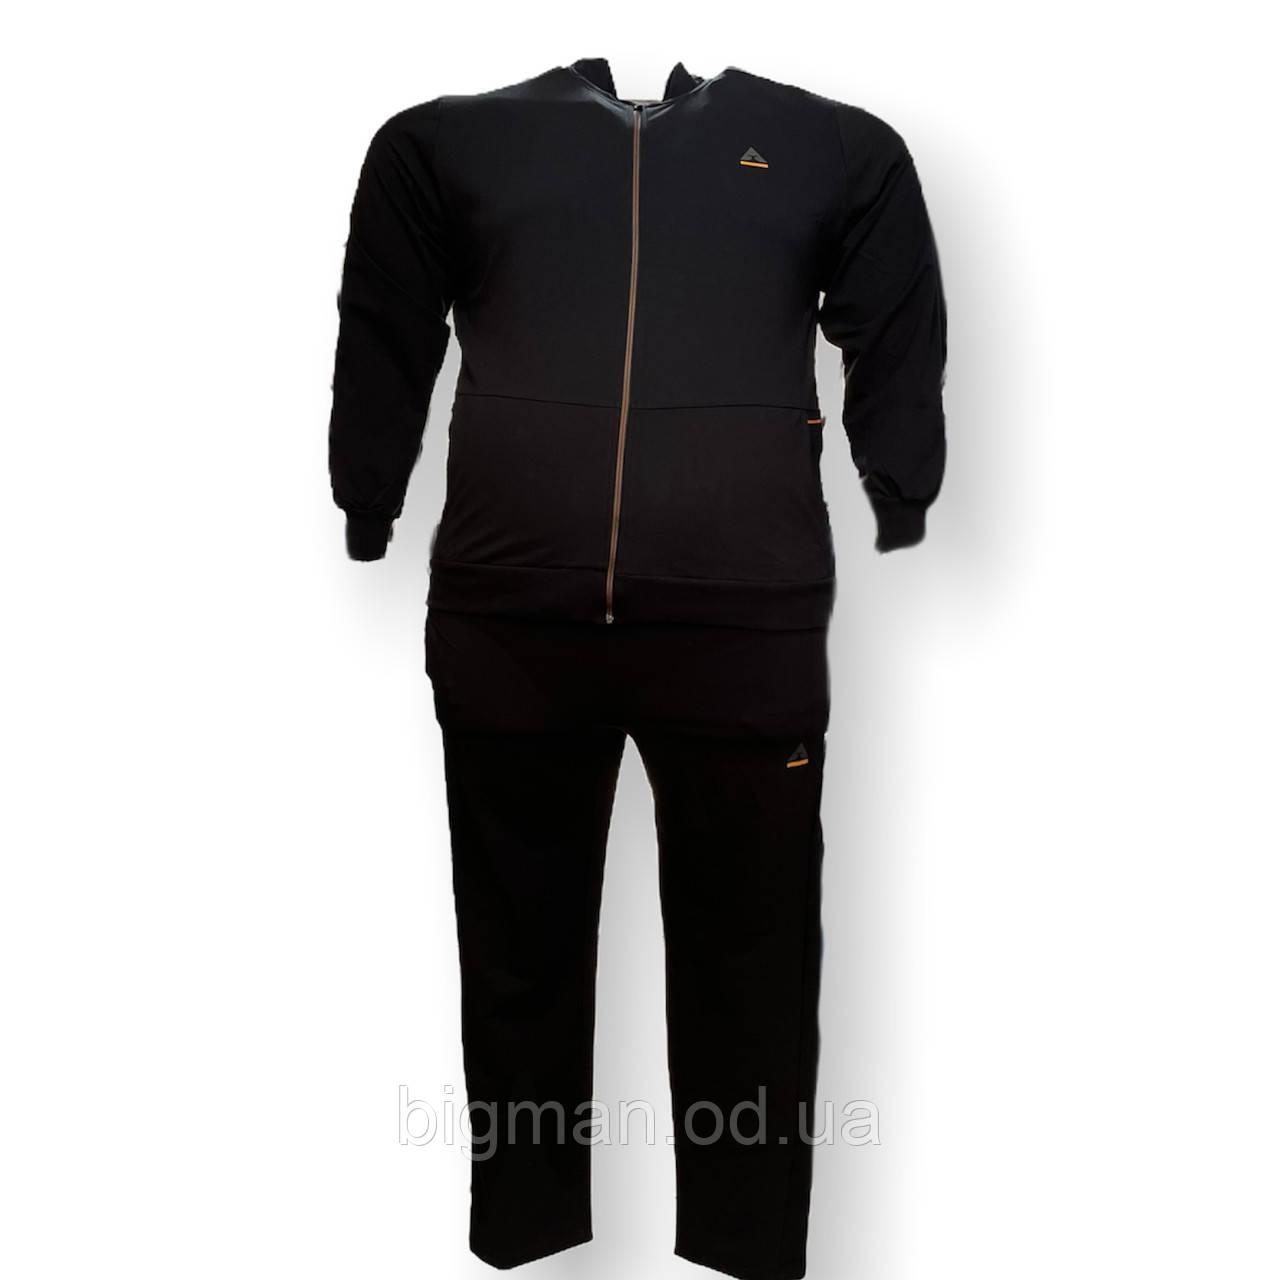 Мужской спортивный костюм Grand la Vita 15030 3XL 4XL 6XL 7XL черный Турция трикотаж батал